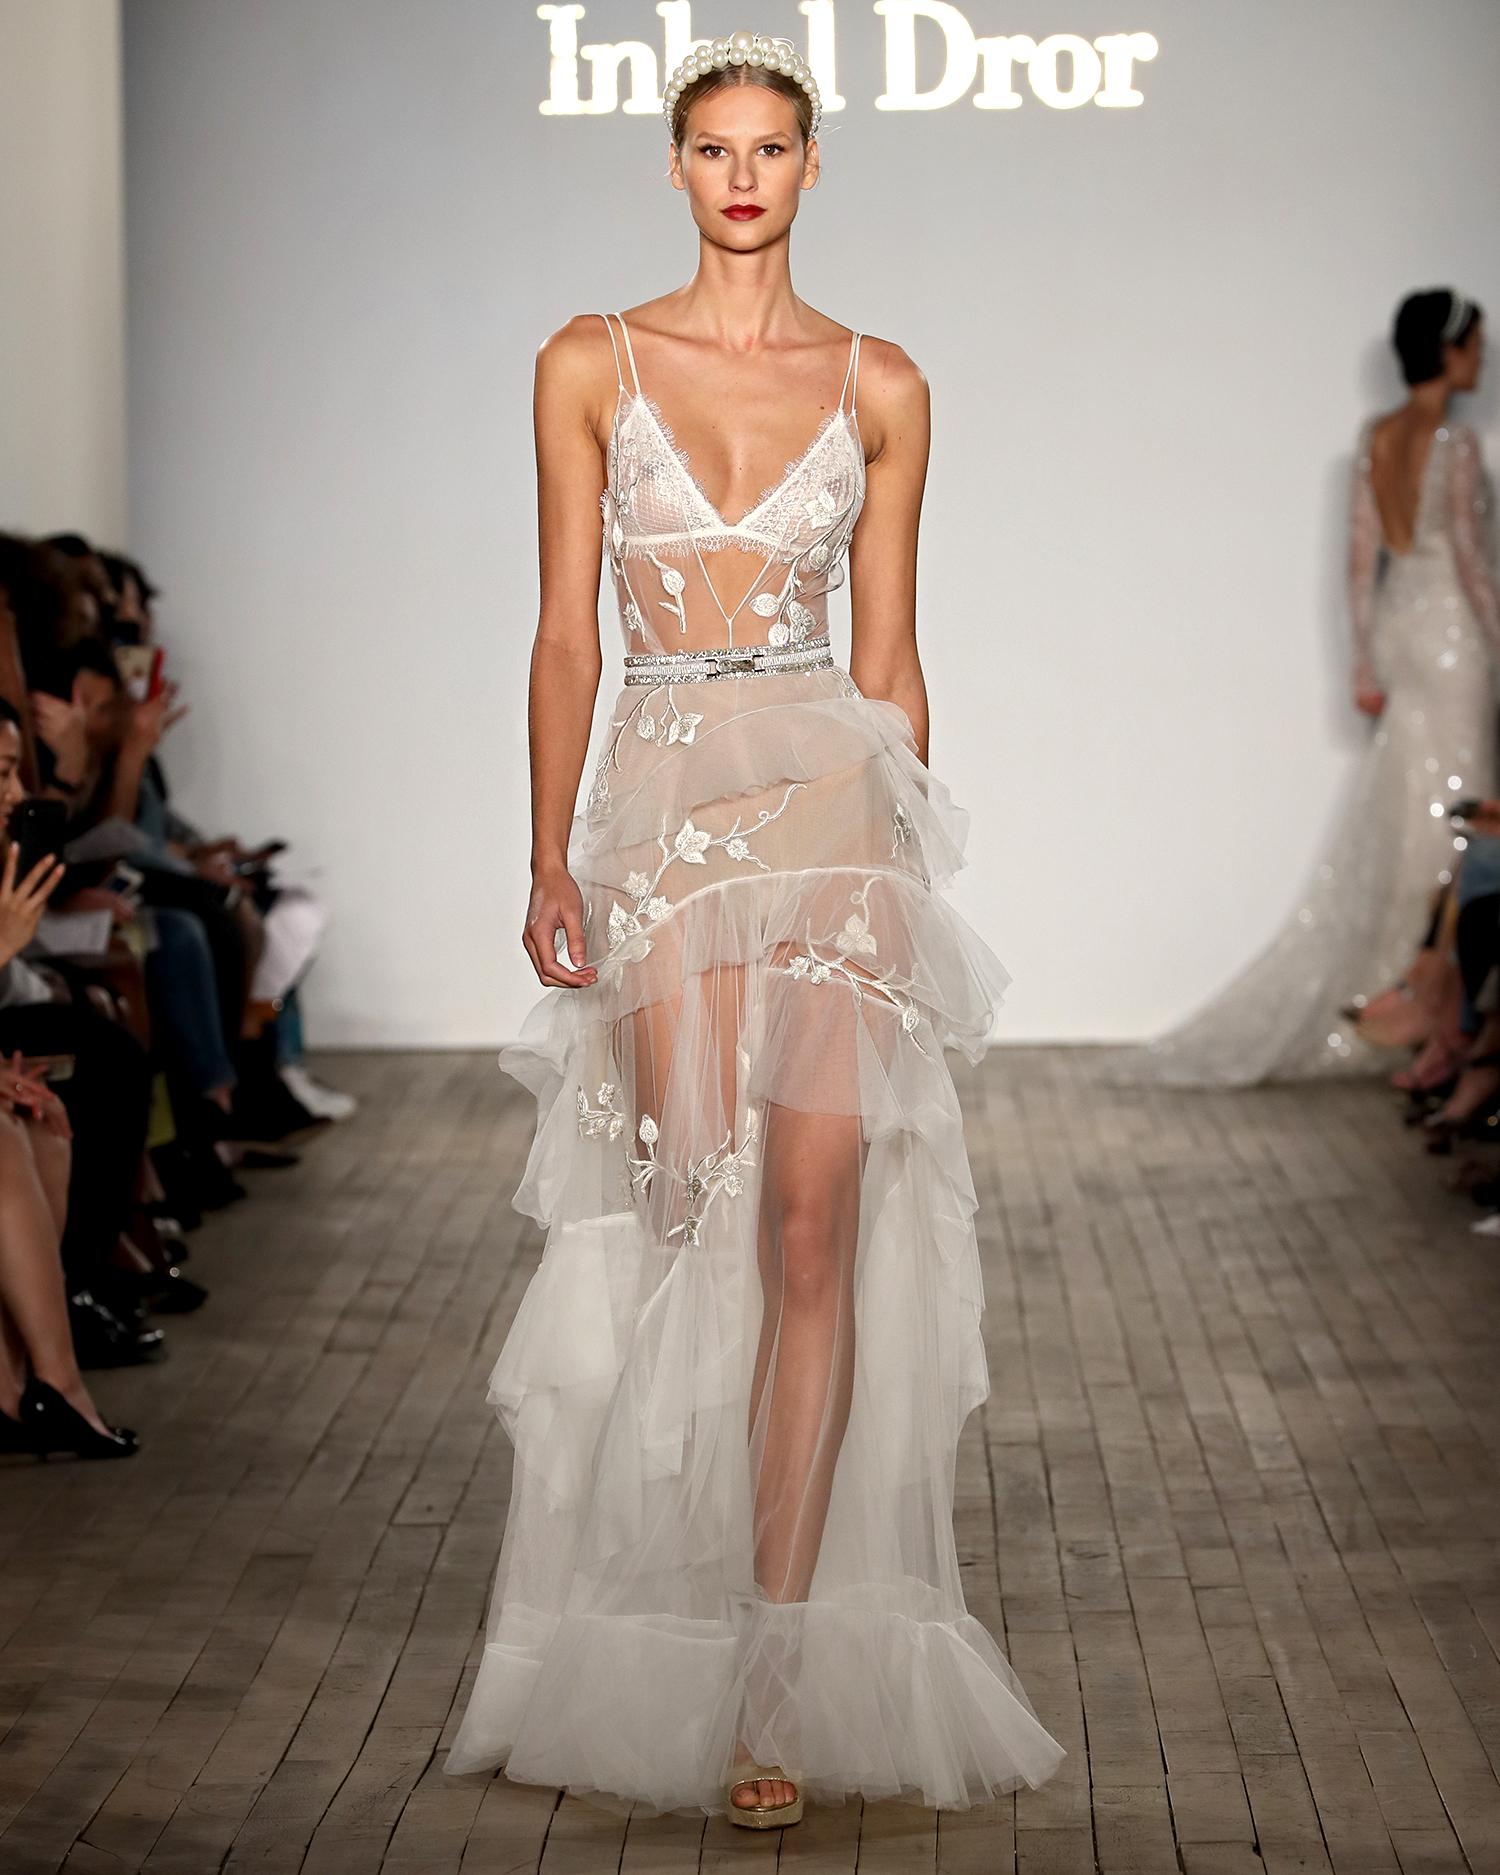 inbal dror wedding dress sheer spaghetti strap with tiered skirt